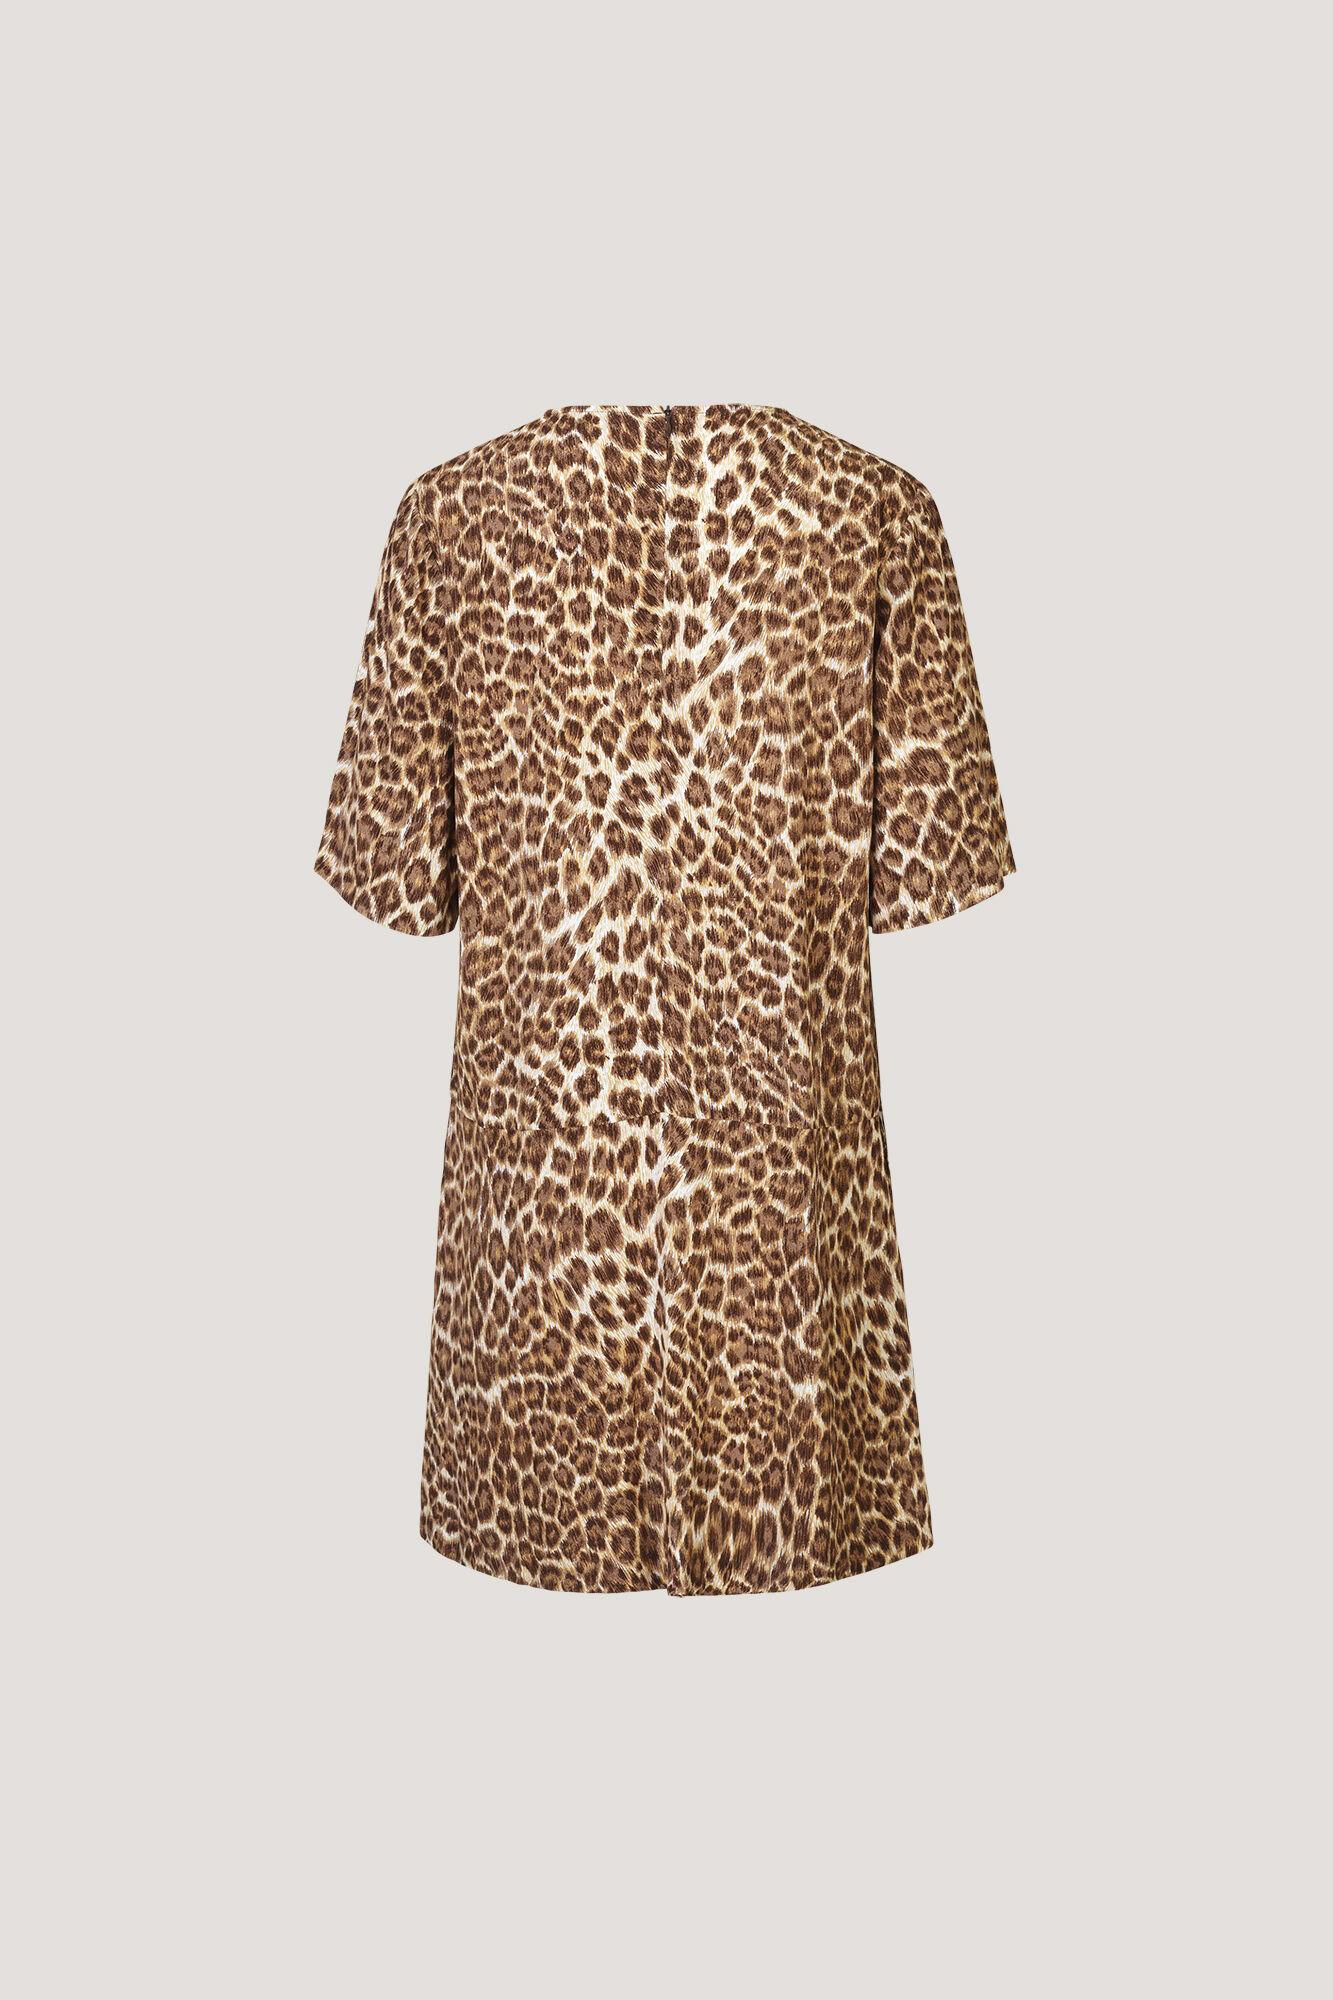 Adelaide dress aop 6515